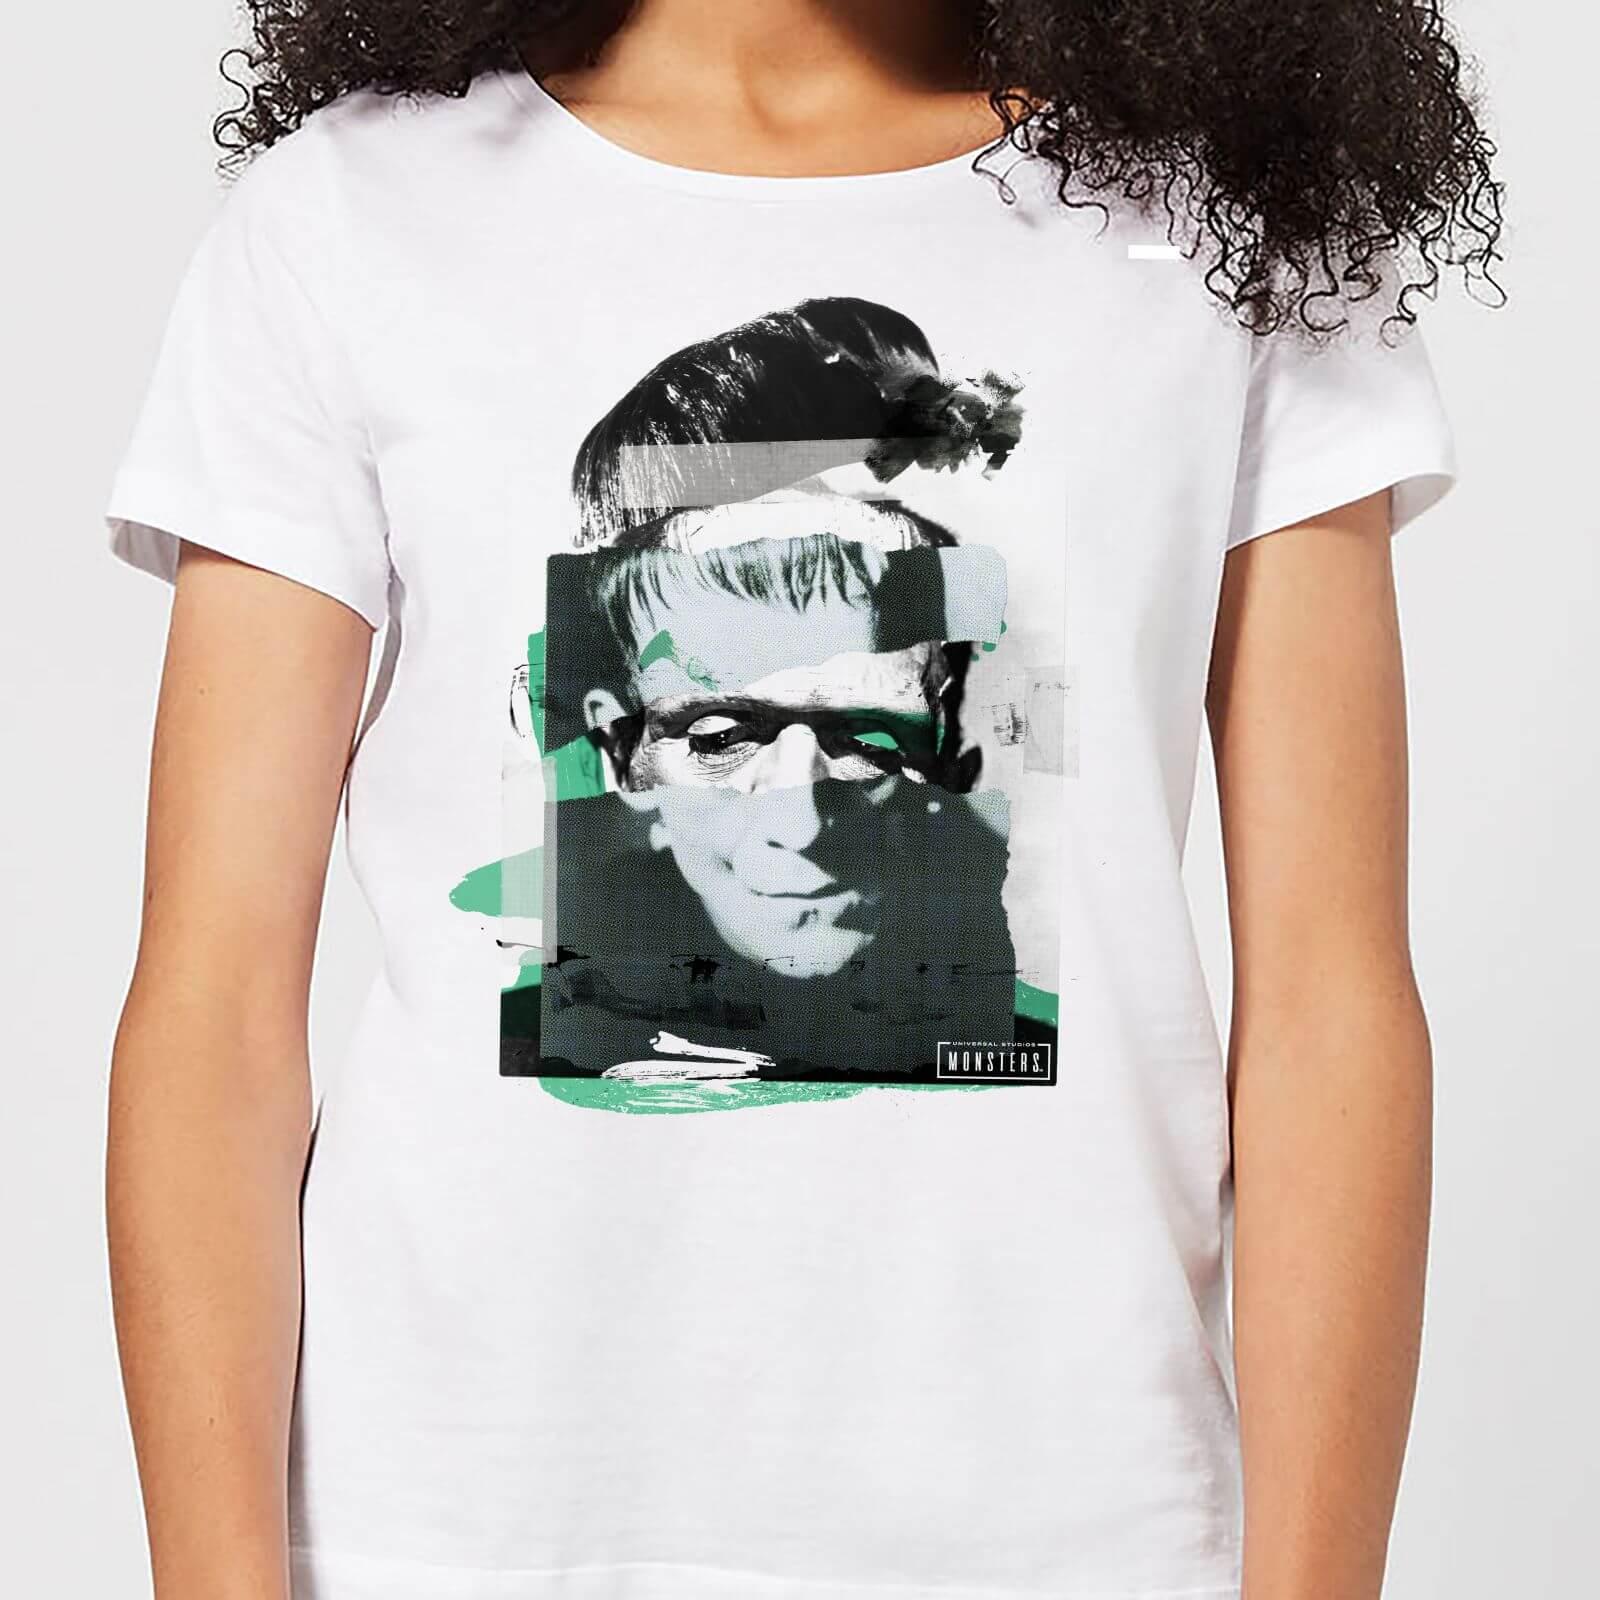 Universal Monsters Frankenstein Collage Women's T-Shirt - White - XL - White